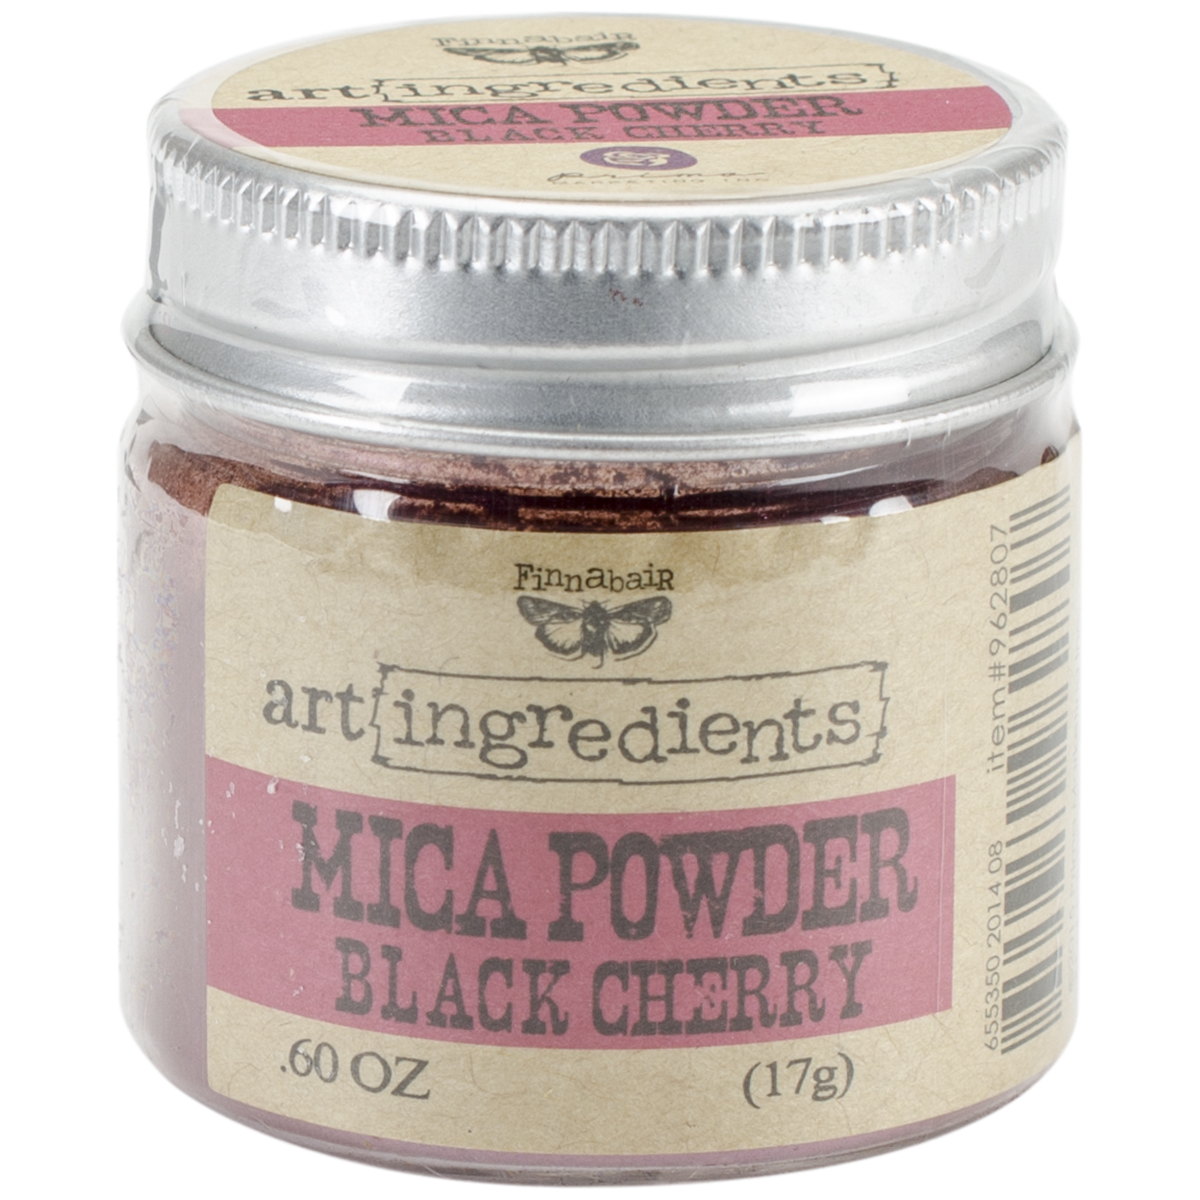 Mica Powder - Black Cherry